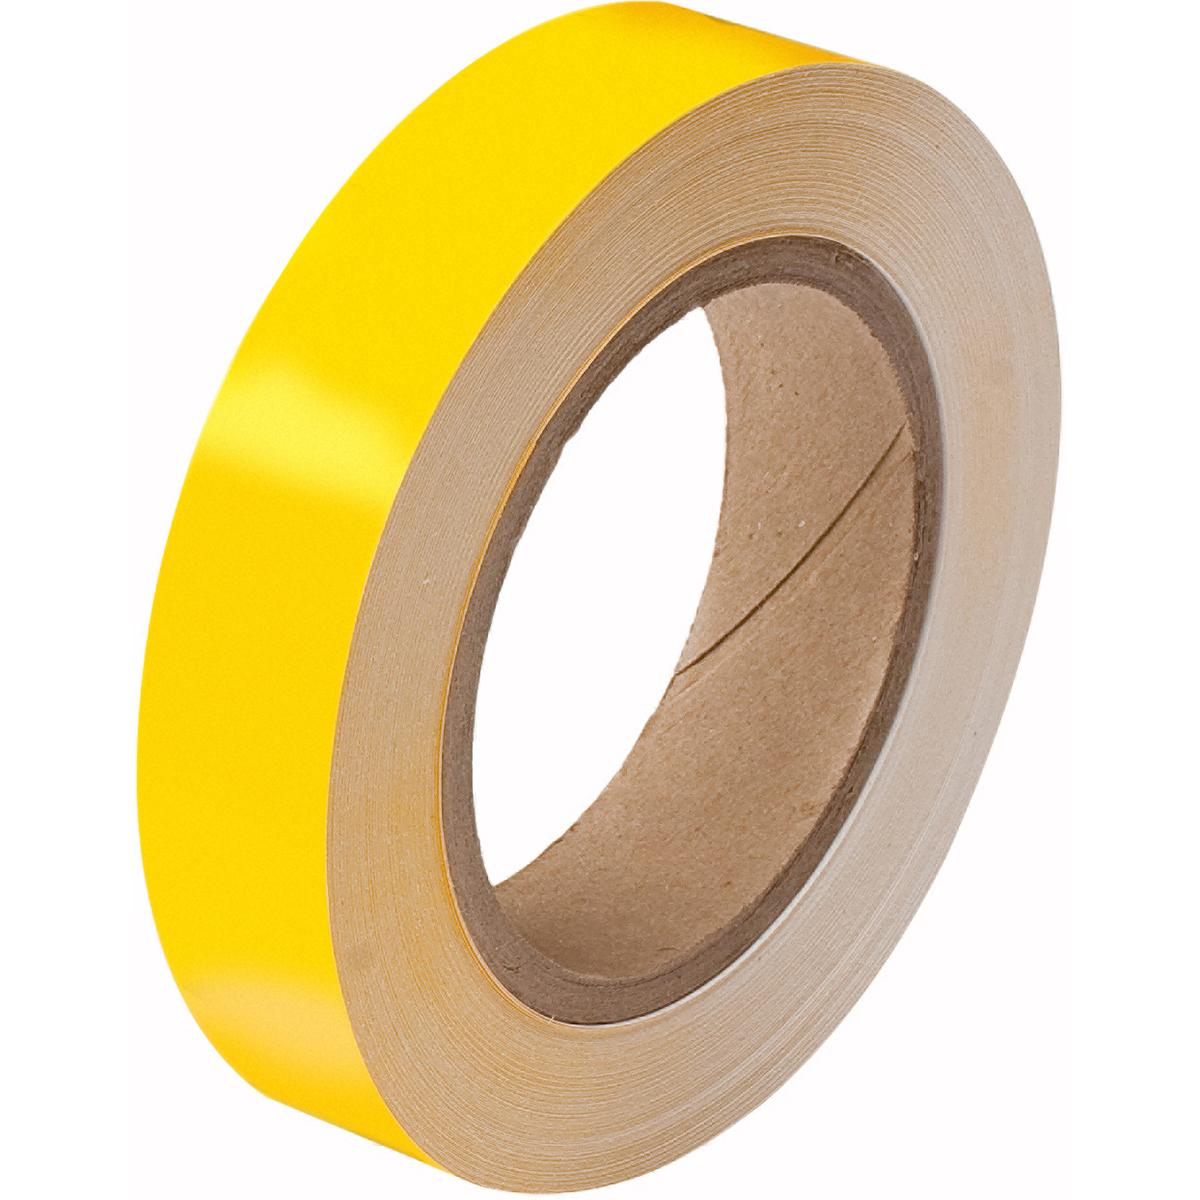 Pipe Banding Tape - Yellow